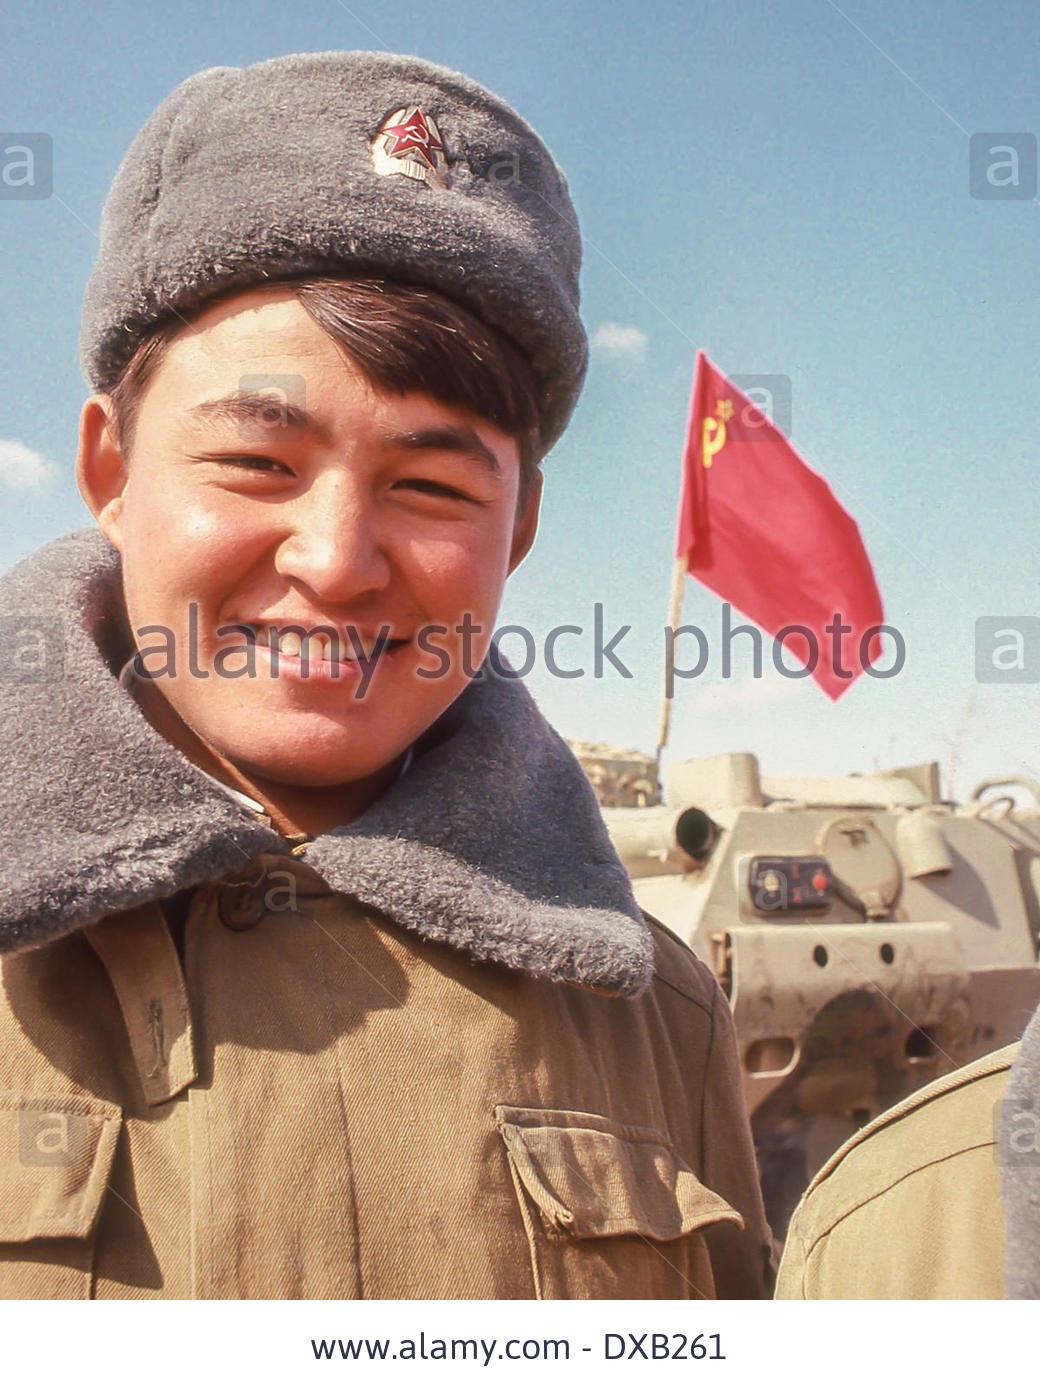 Soviet Afghanistan war - Page 5 Feb_16_1989_termez_uzbekistan_ru_a_smiling_sovie